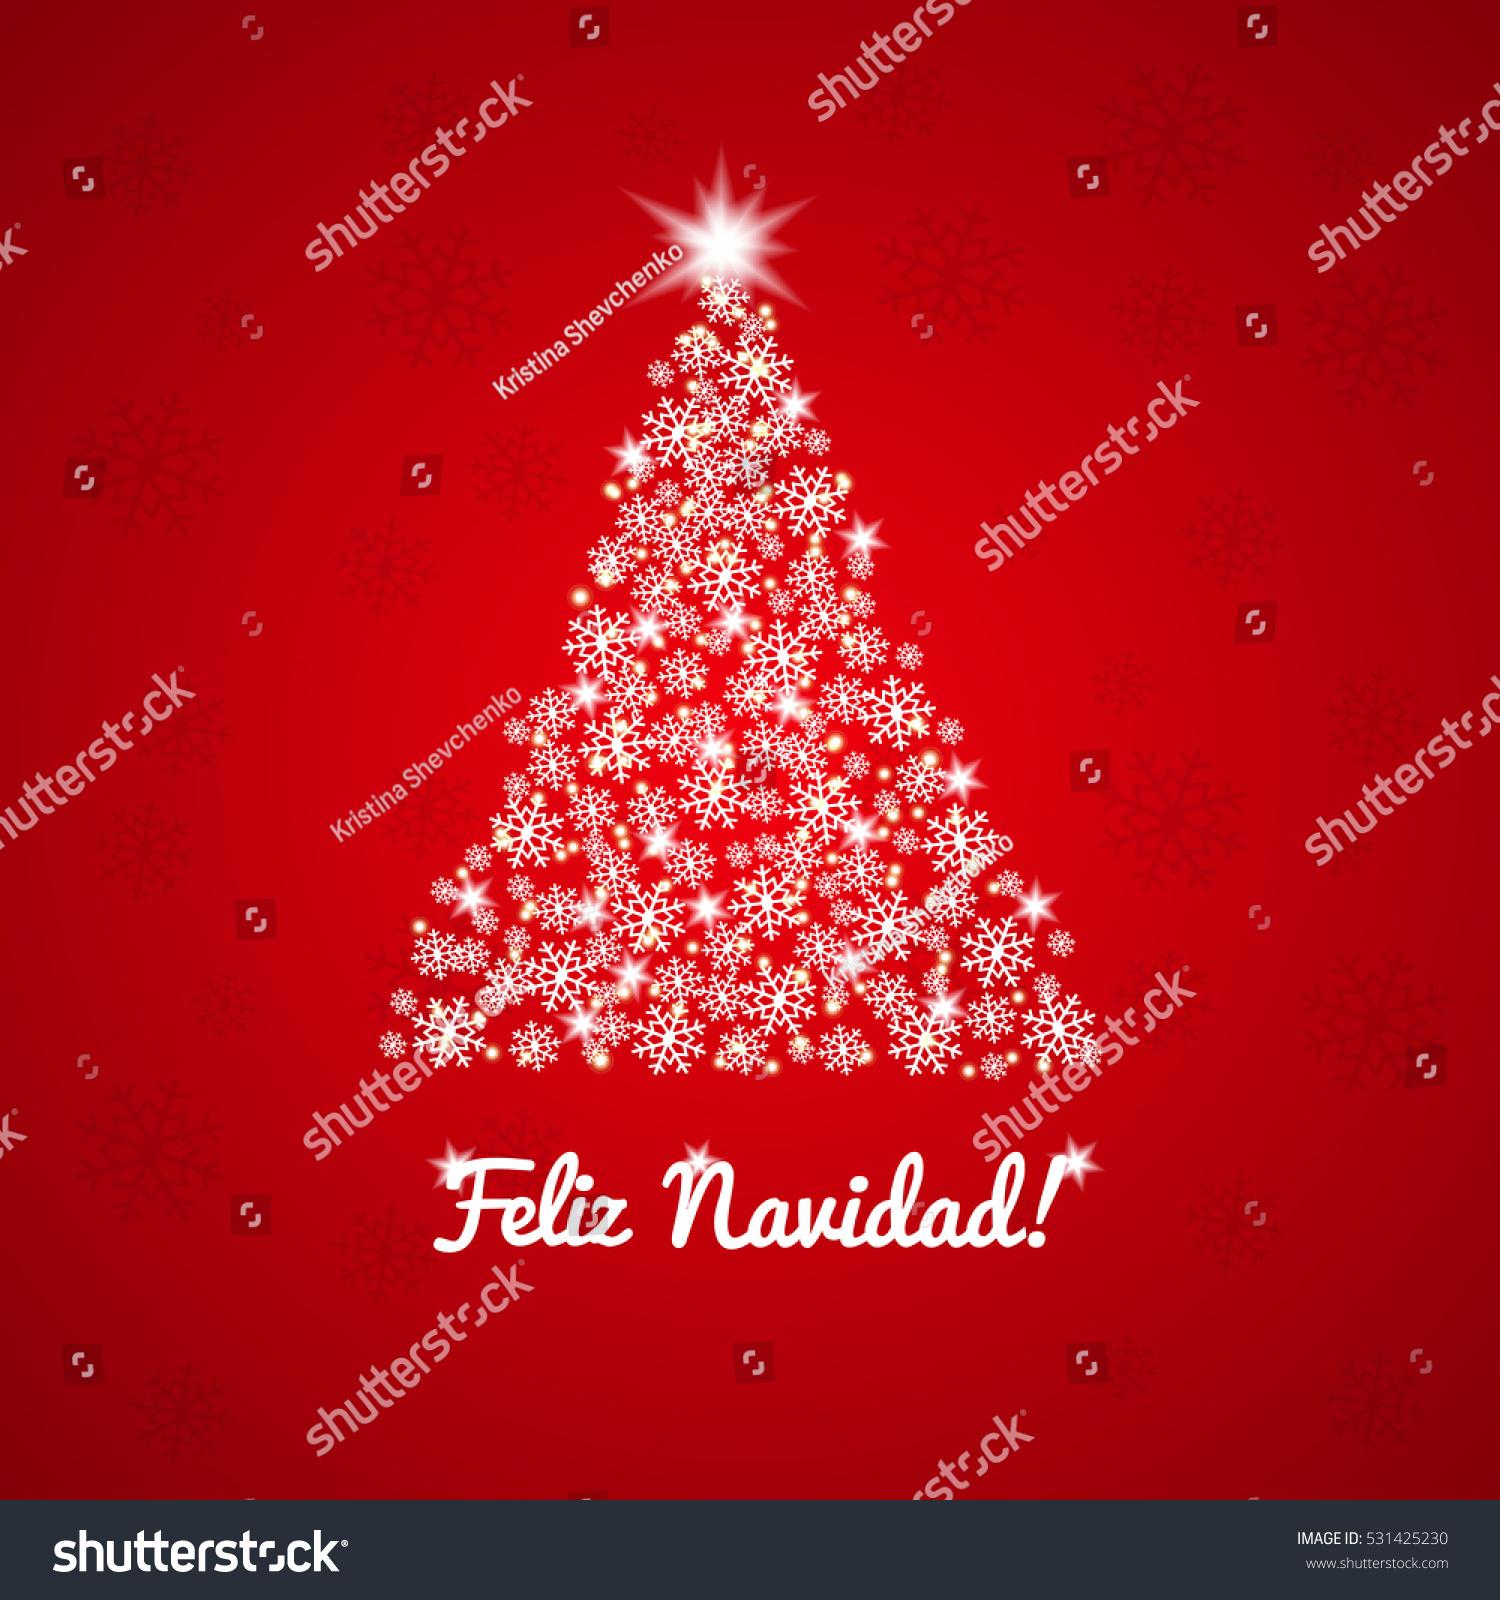 Feliz navidad christmas vector greeting card stock vector 531425230 feliz navidad christmas vector greeting card spanish greeting m4hsunfo